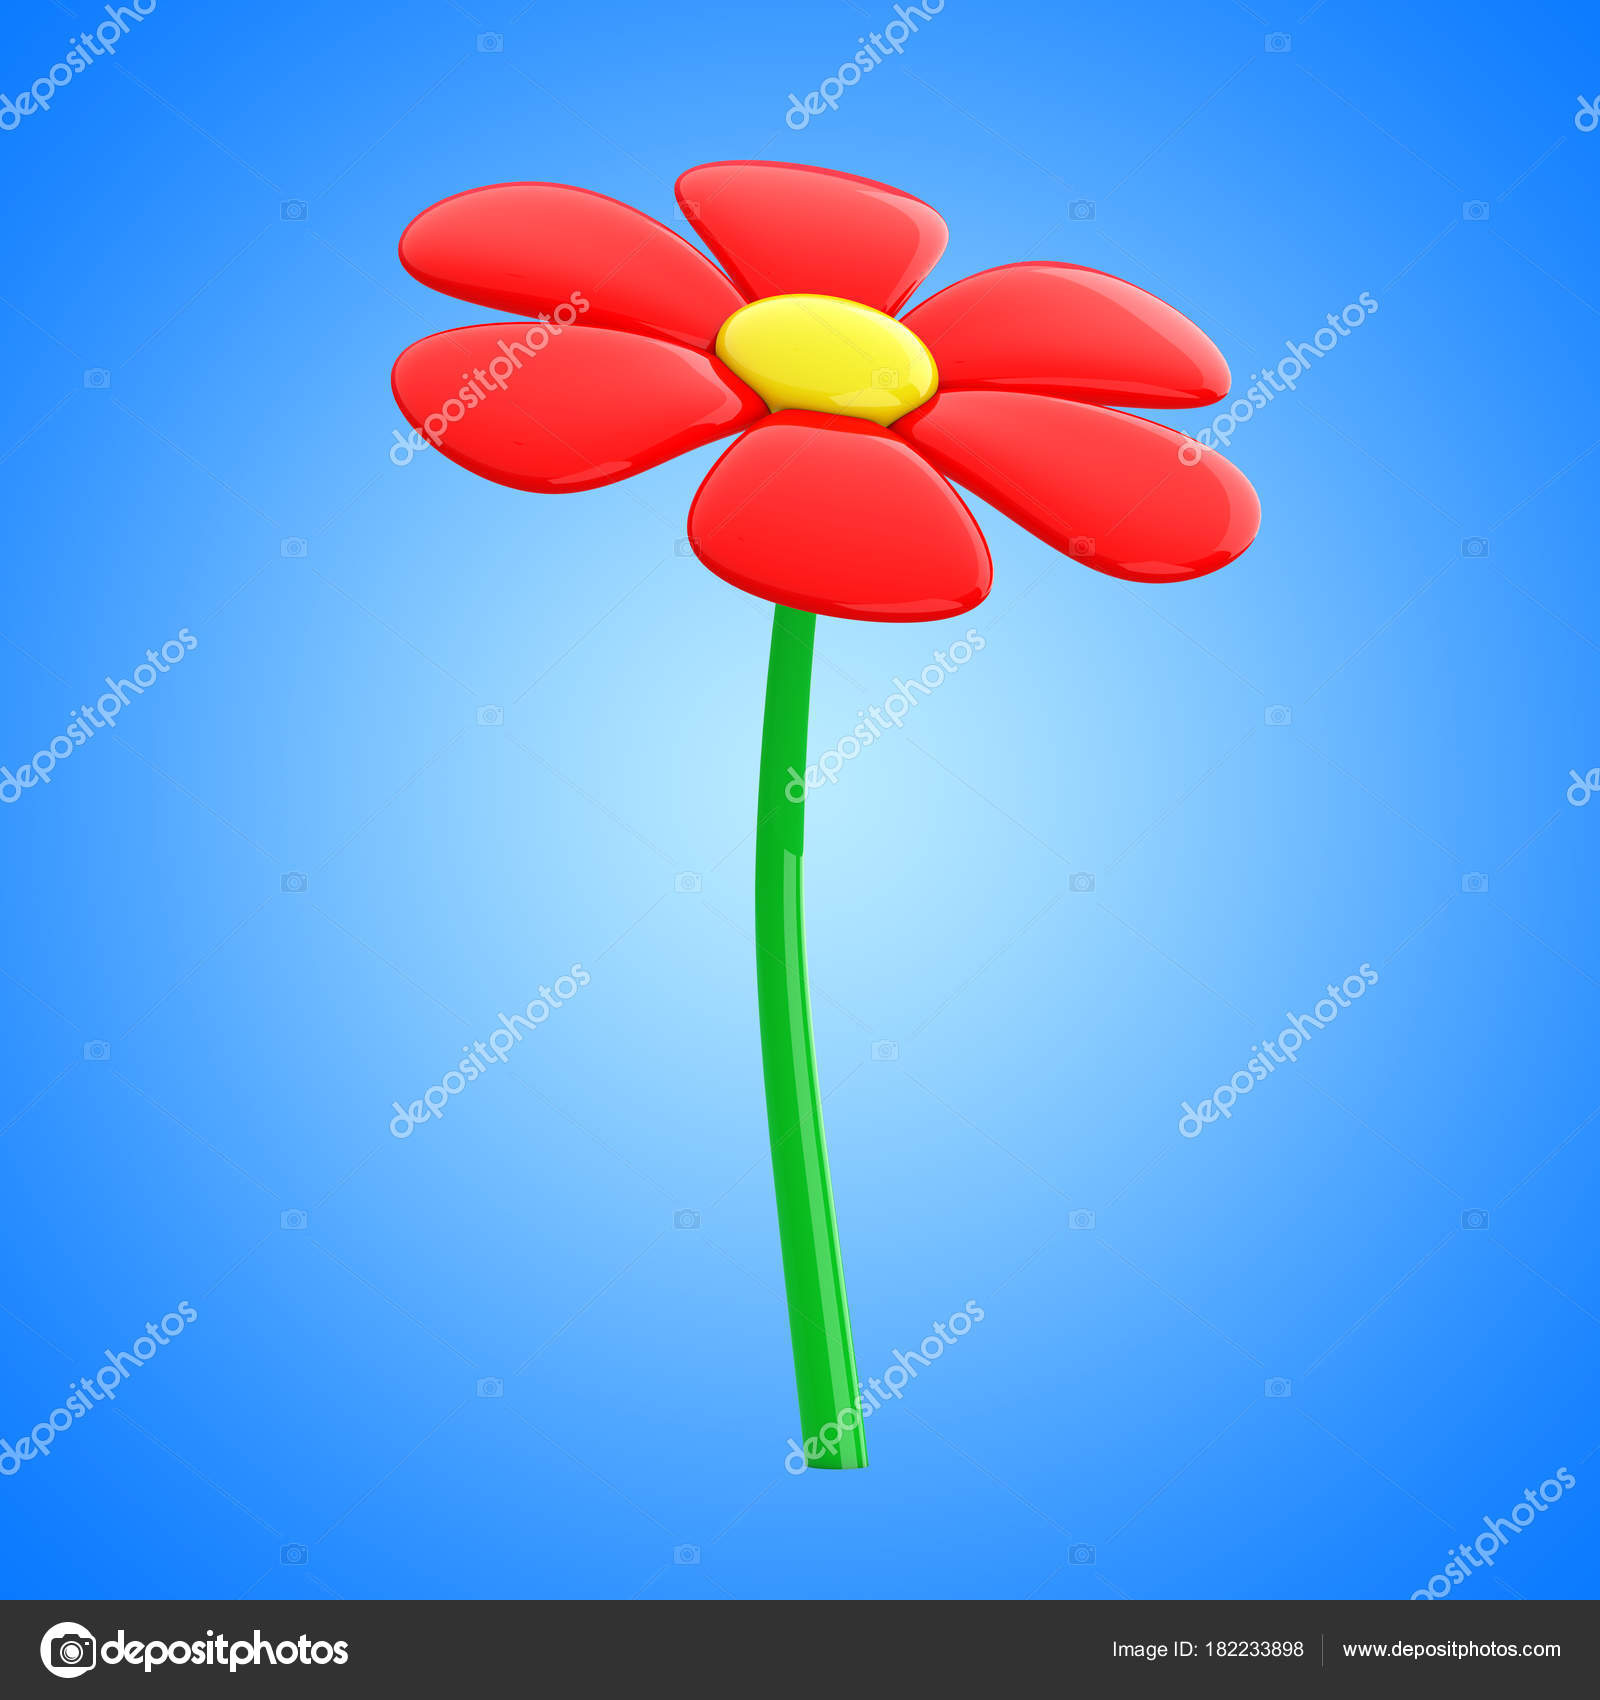 Beautiful red cartoon flower 3d rendering stock photo doomu beautiful red cartoon flower on a blue background 3d rendering photo by doomu izmirmasajfo